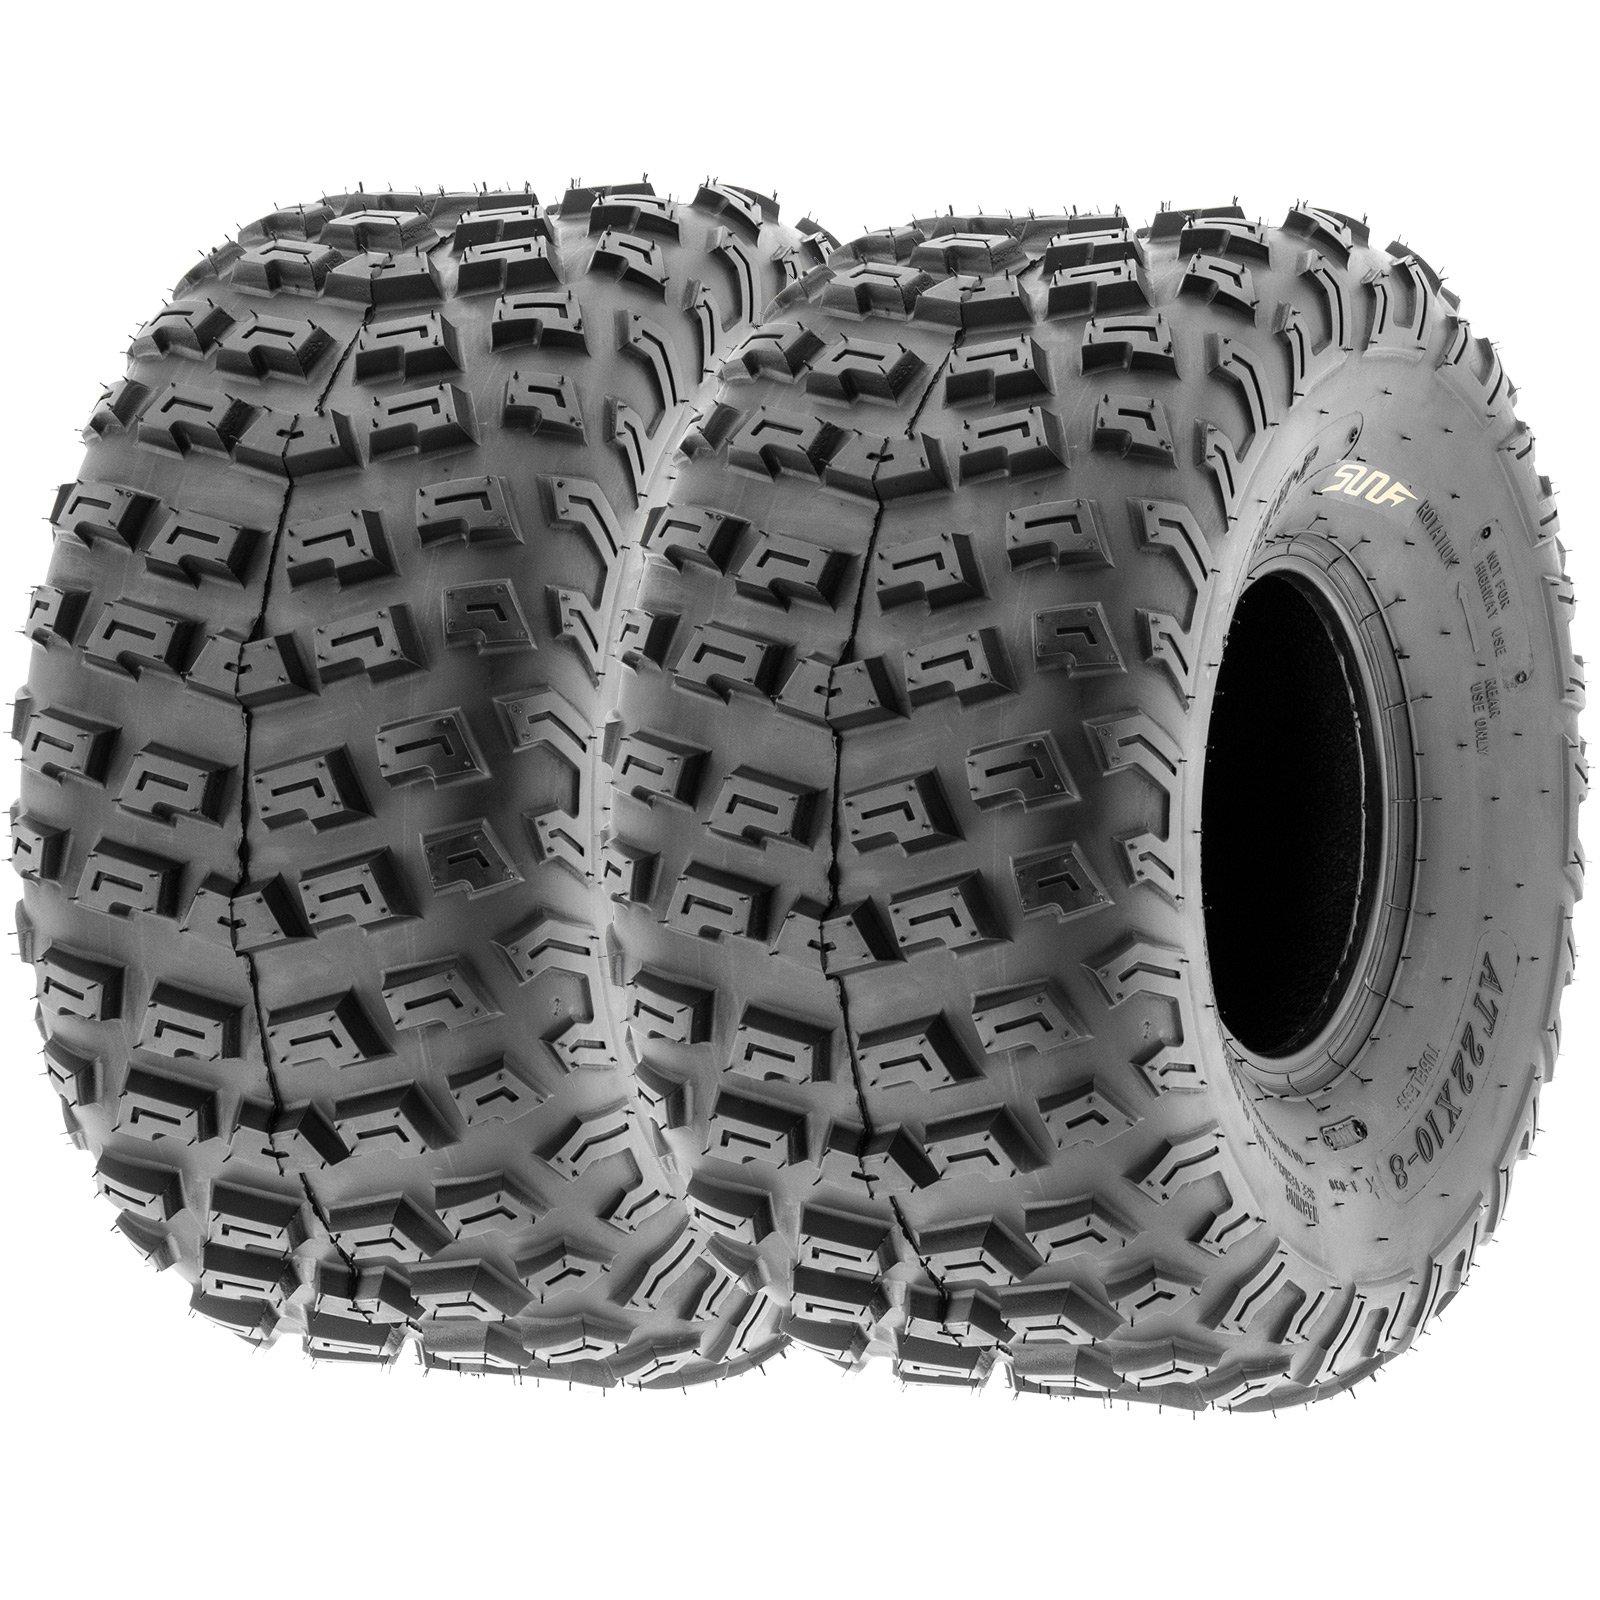 4 Ply 20x11-9 Kenda Speed Racer K547 Rear ATV UTV Tire 20x11 20-11-9 20x11x9